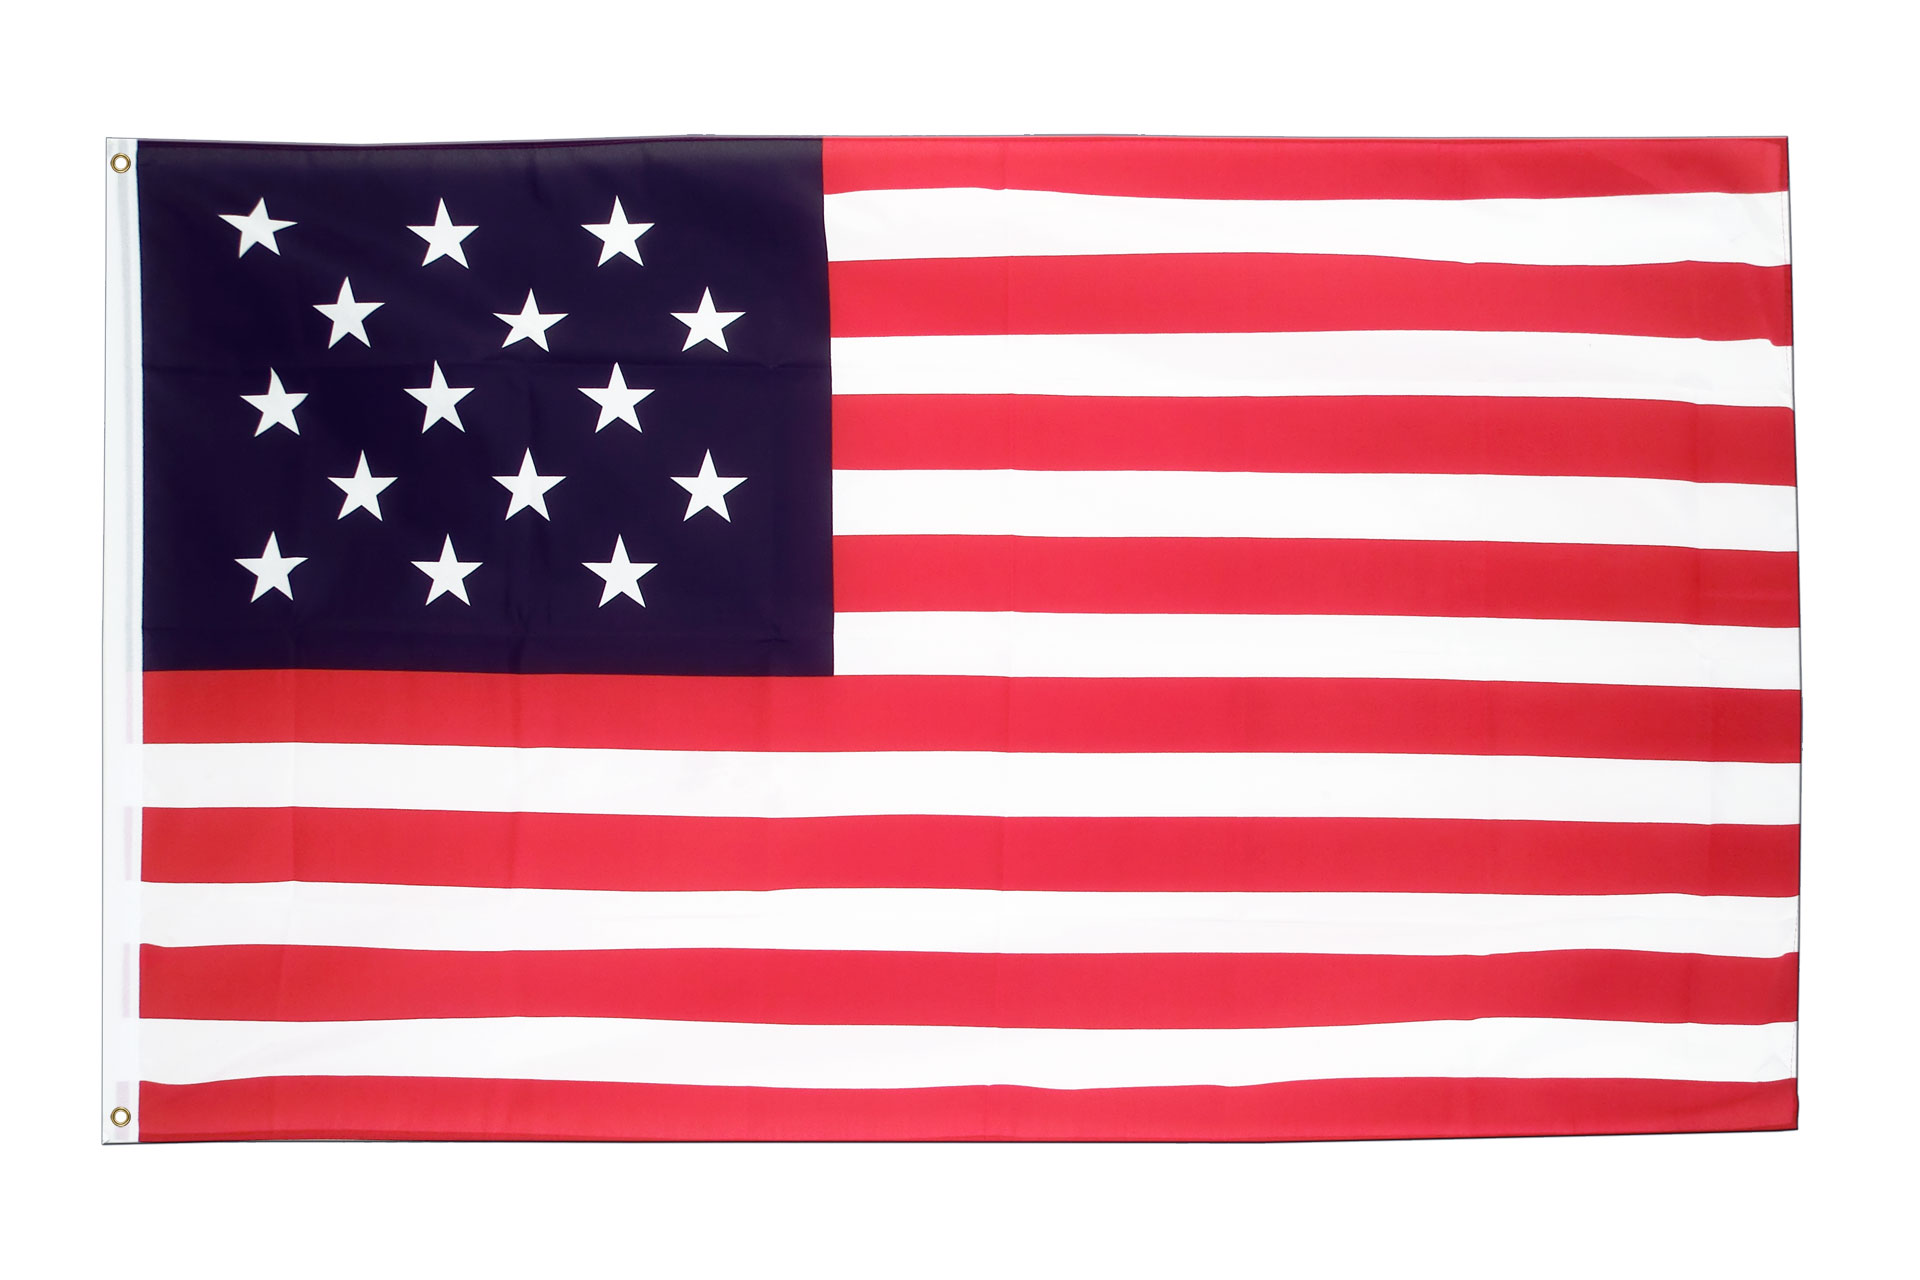 Drapeau USA 15 Etoiles